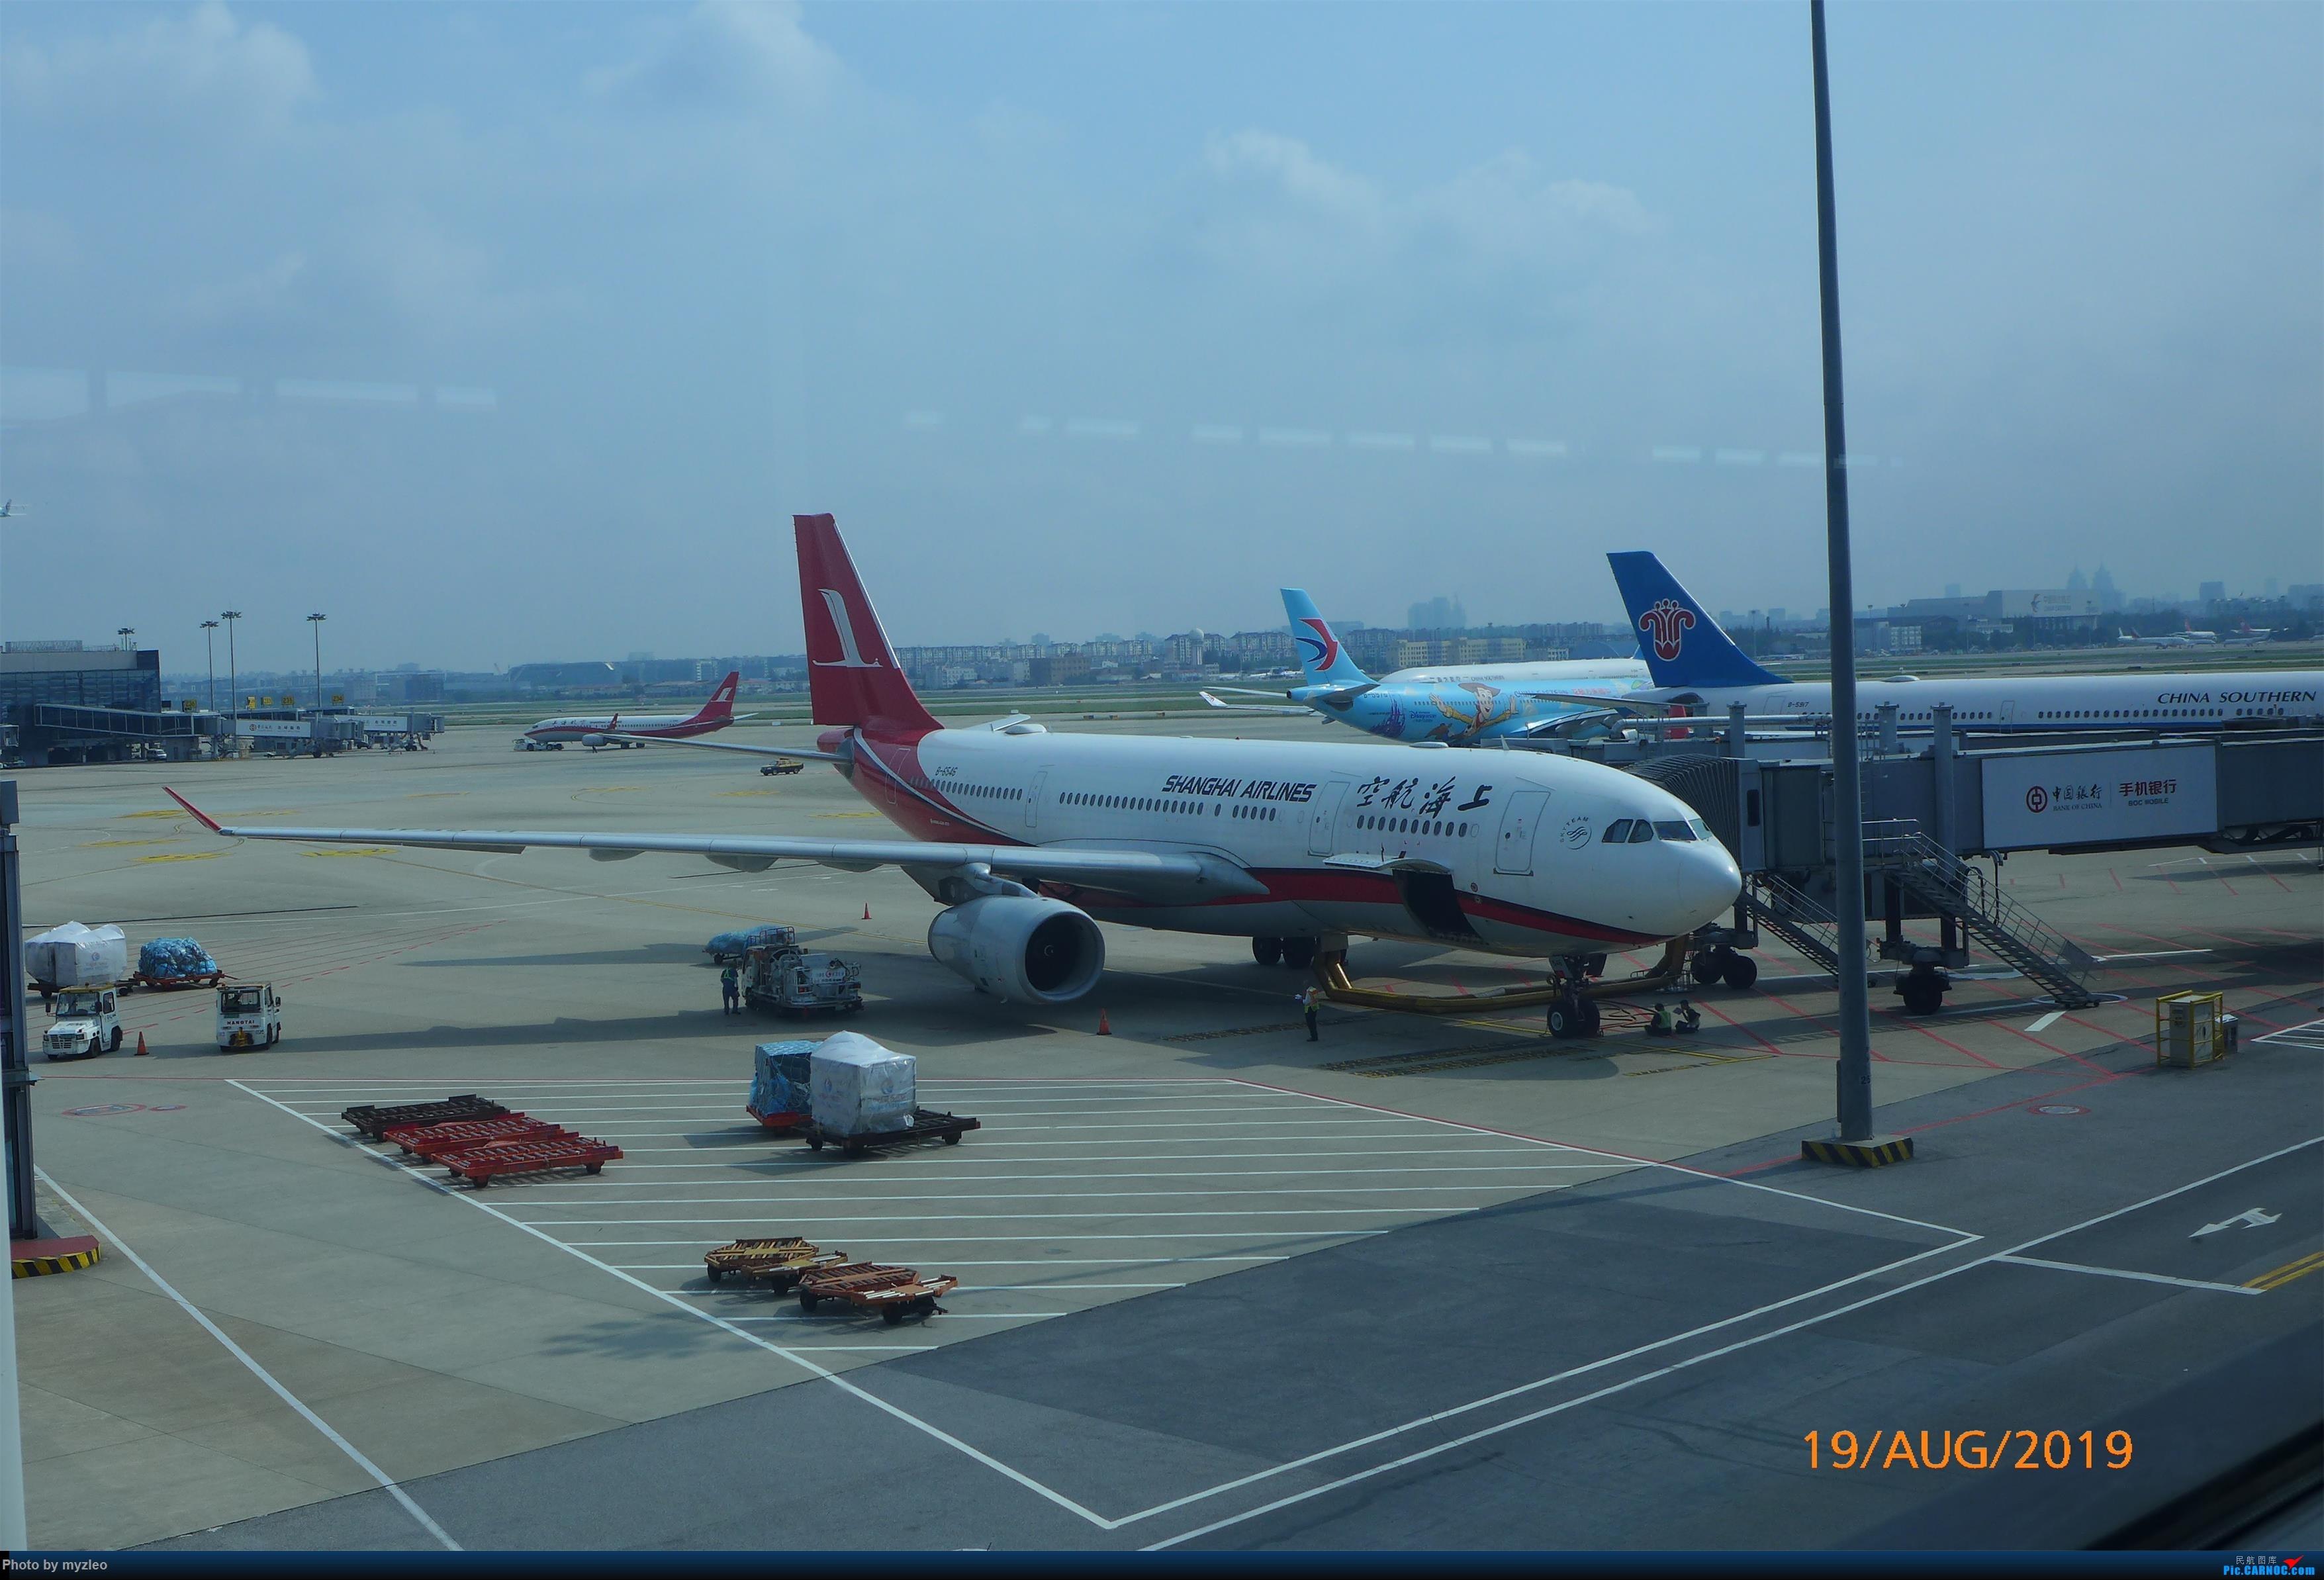 Re:[原创]【myzleo的游记5.1】梦圆一九(1)首搭国航359,北京城里到处走 AIRBUS A330-200 B-6546 中国上海虹桥国际机场